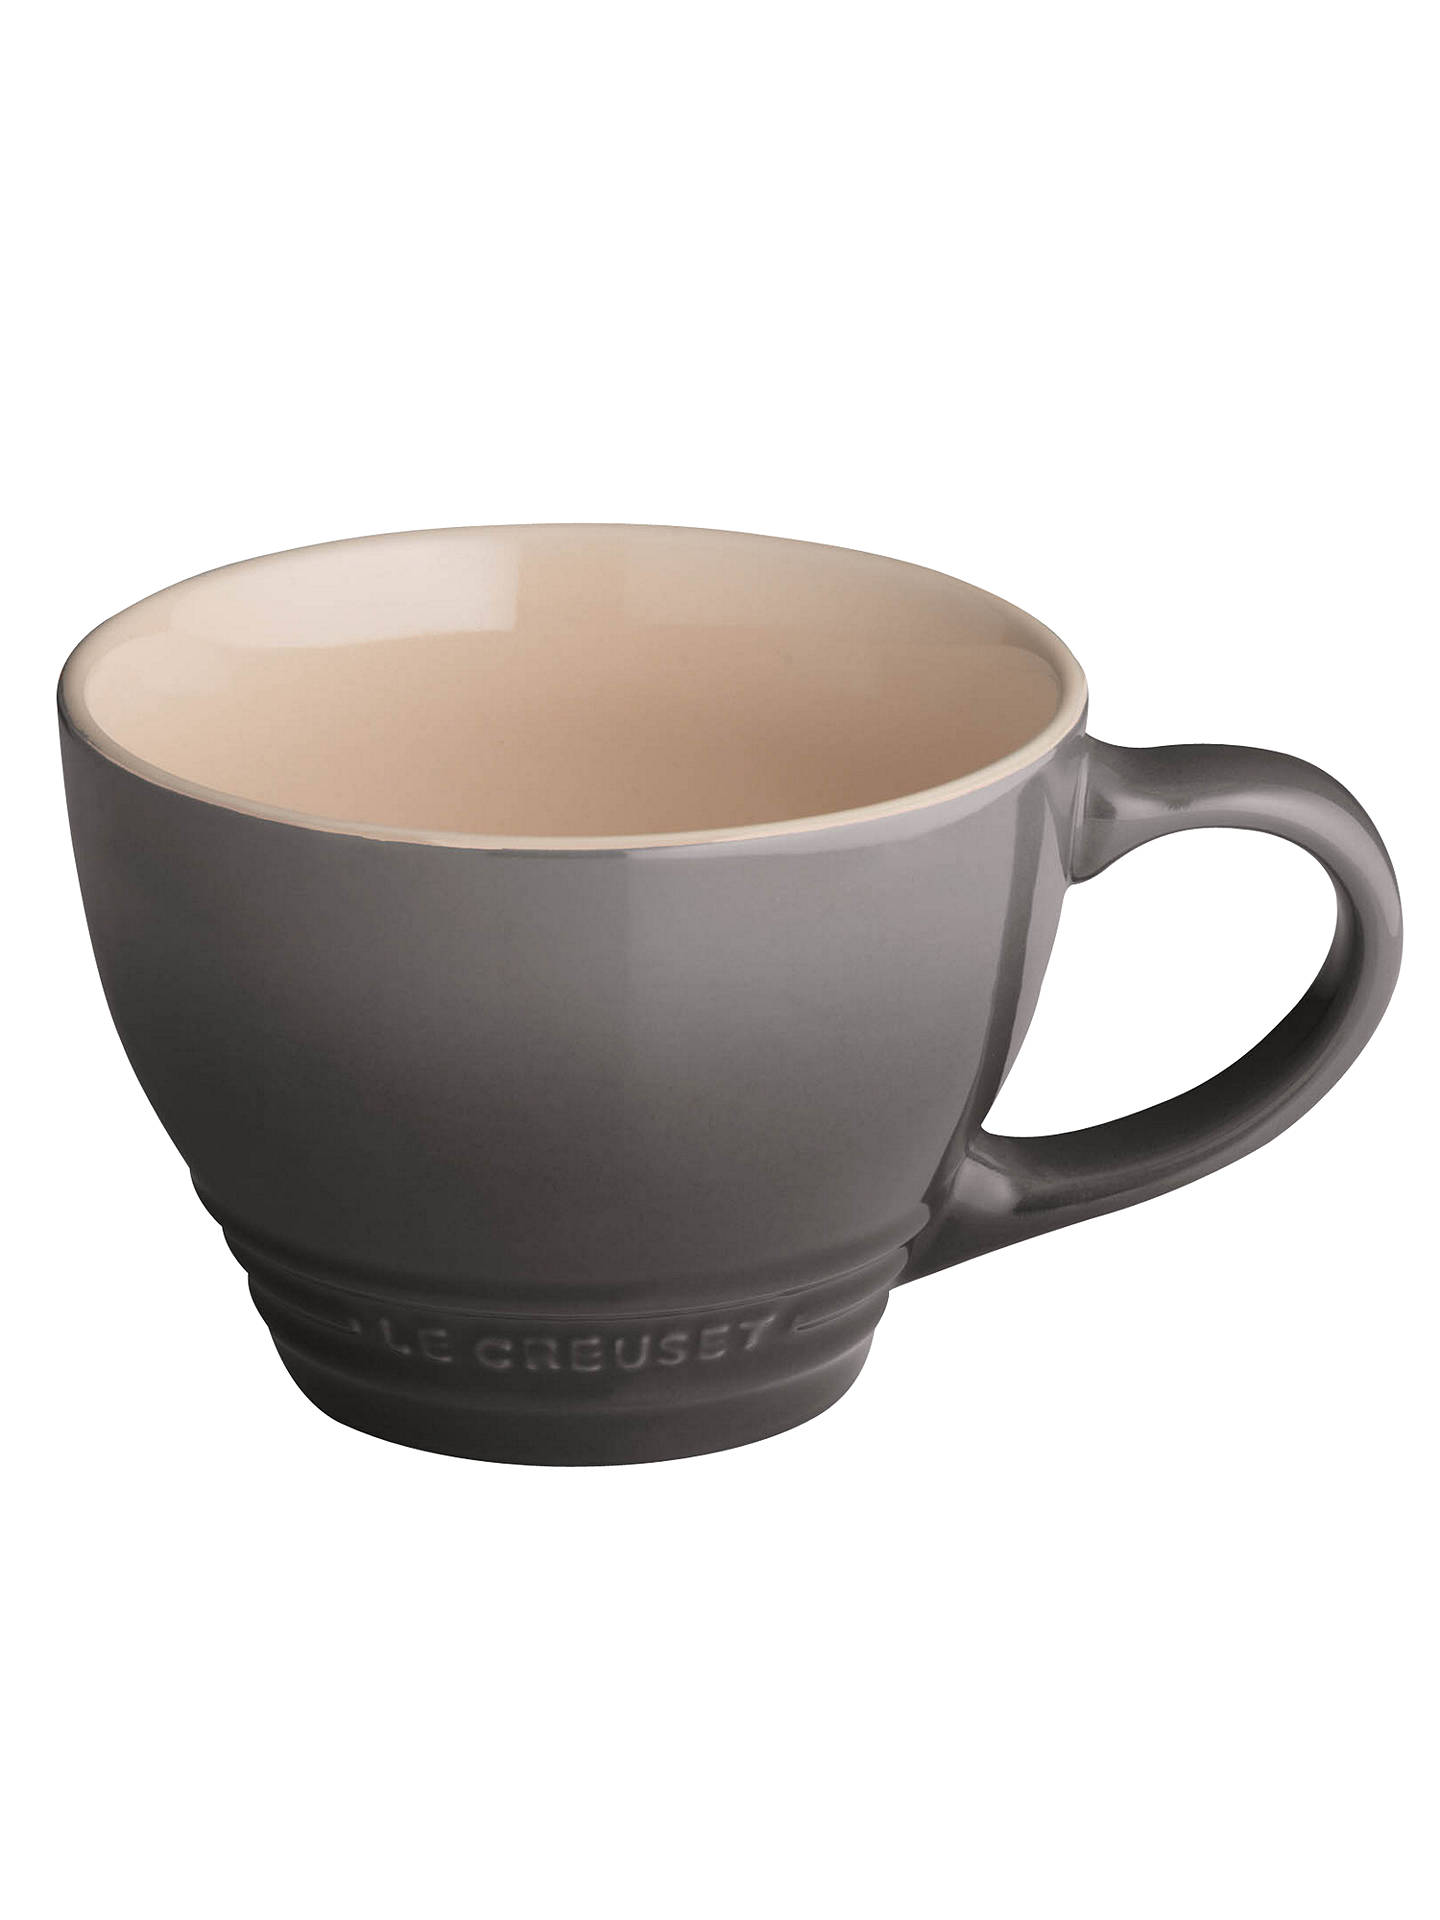 Trademark Innovations Big Giant Coffee Cup Mug by Trademark Innovations